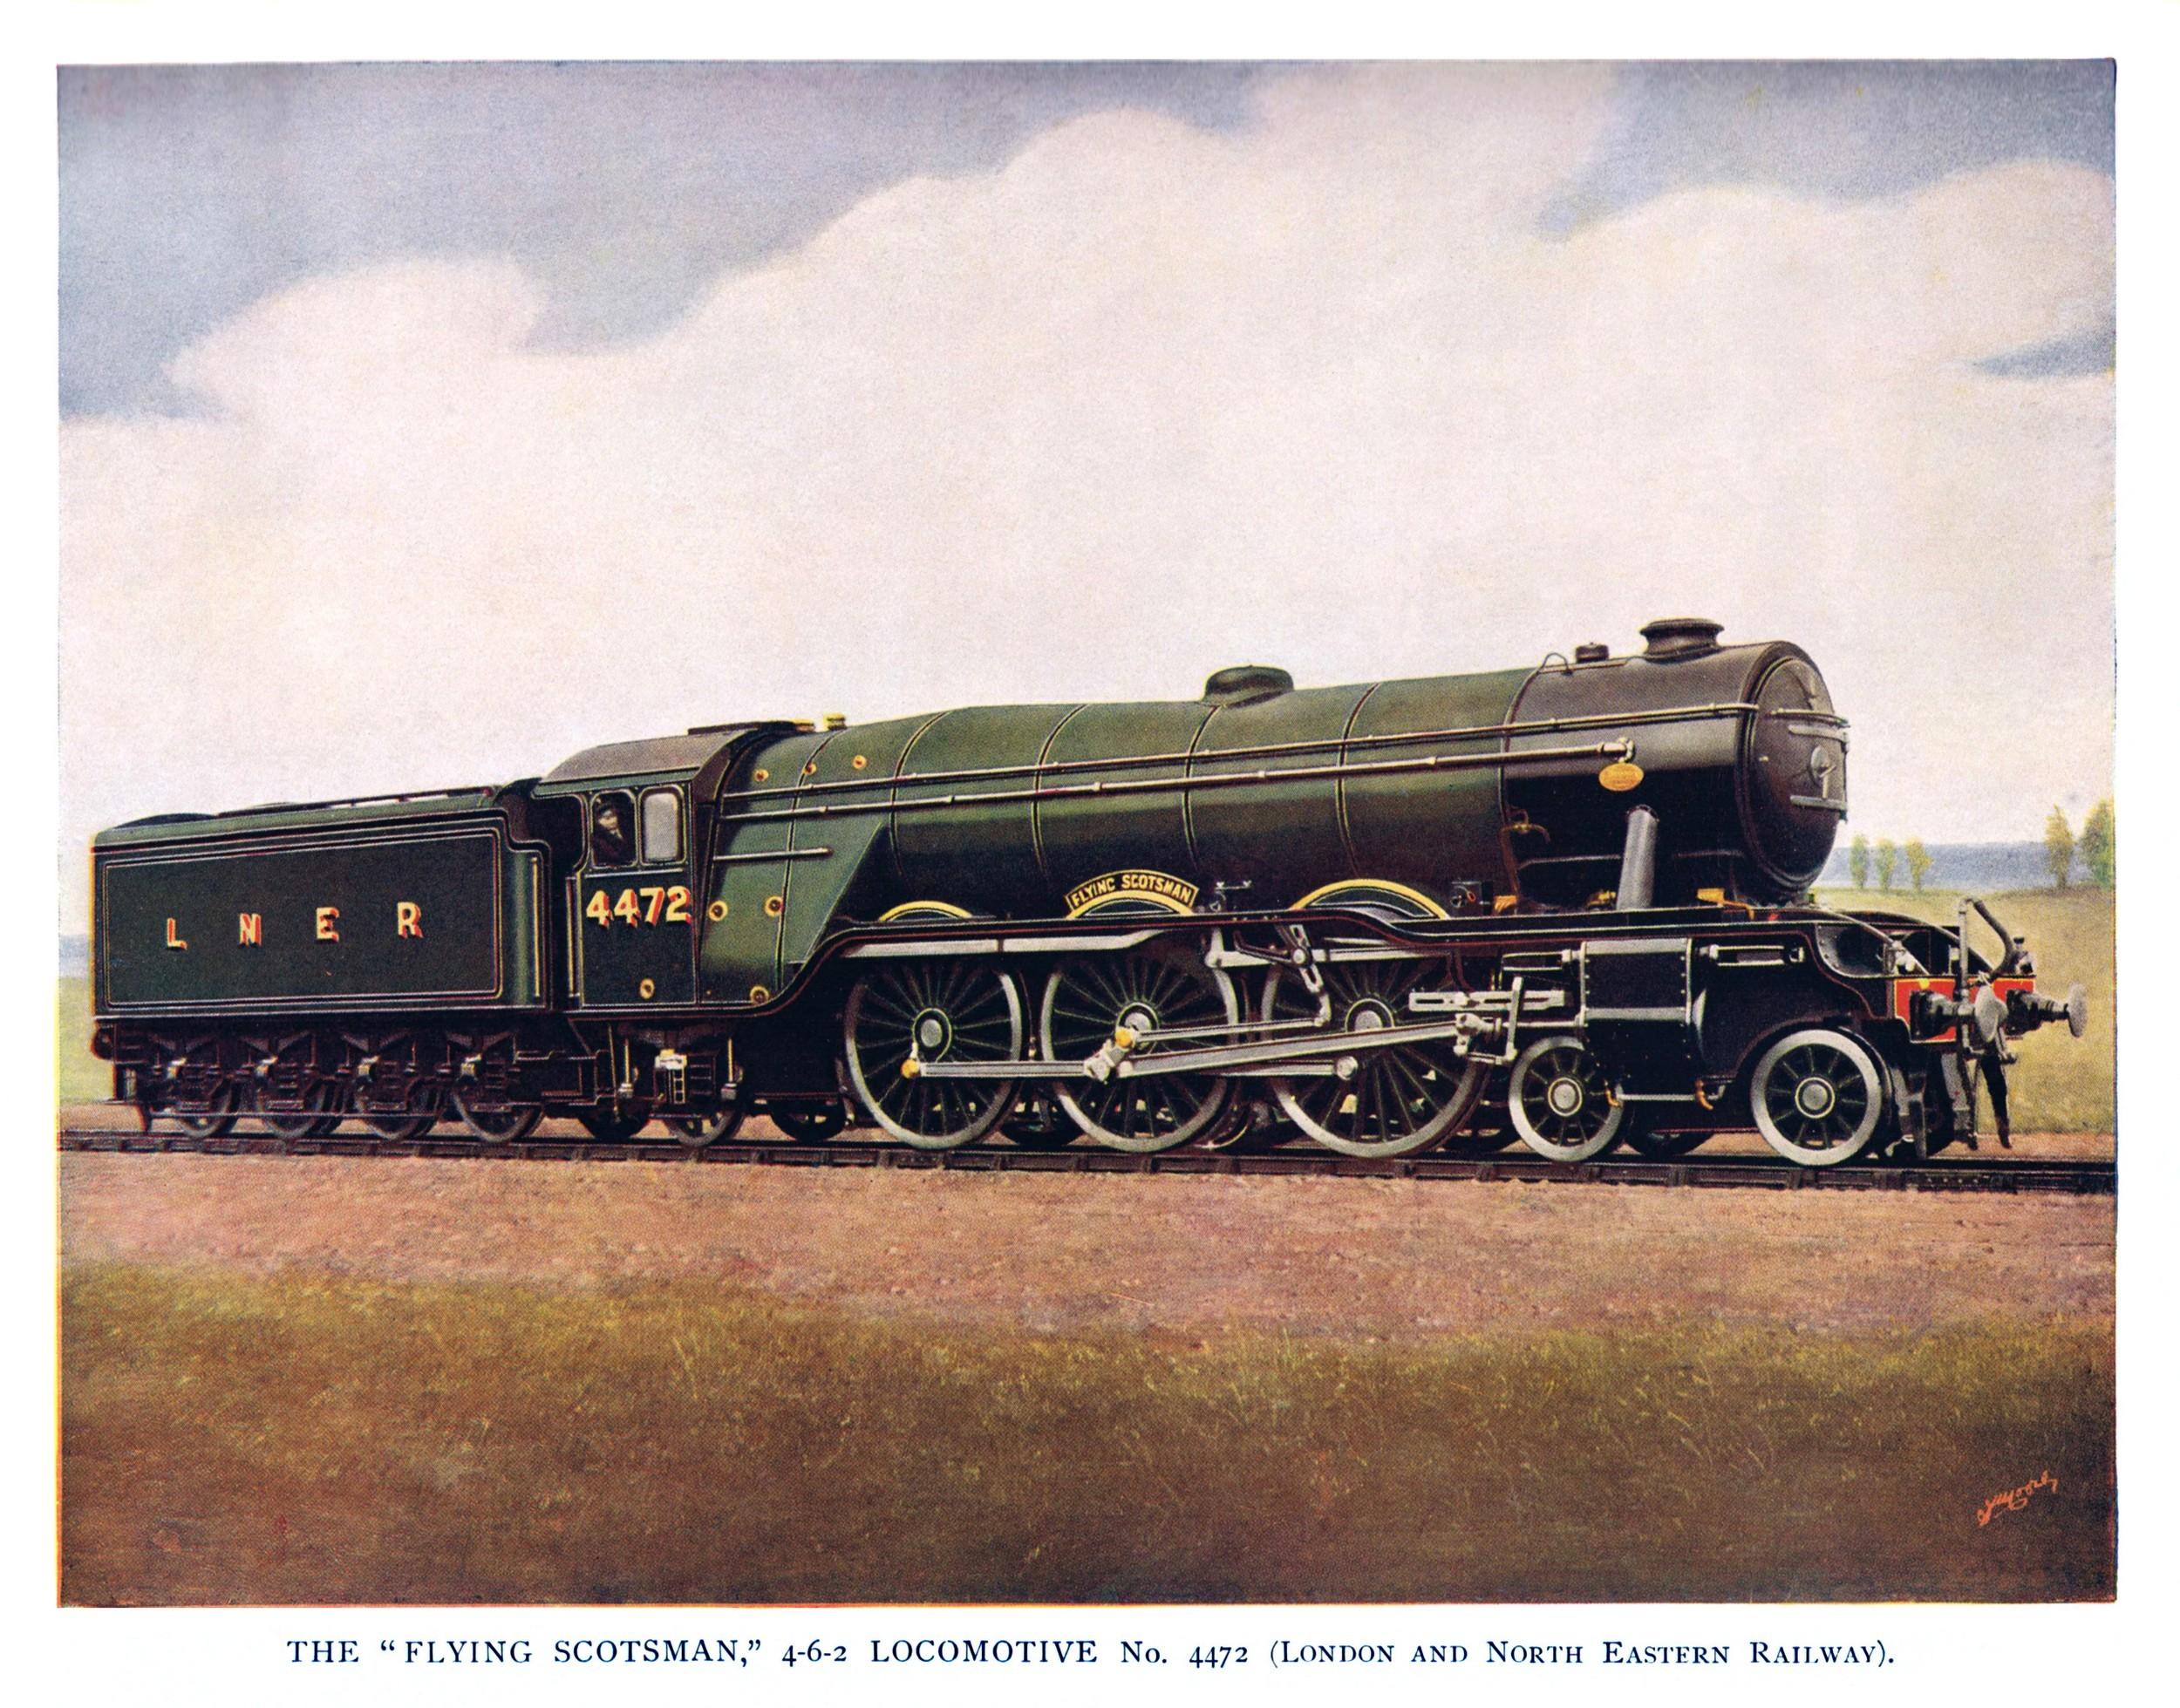 Locomotive Steam Engine Diagram Flying Scotsman Gresley A1 A3 Steam Lo Otive 1923 Lner Br Of Locomotive Steam Engine Diagram